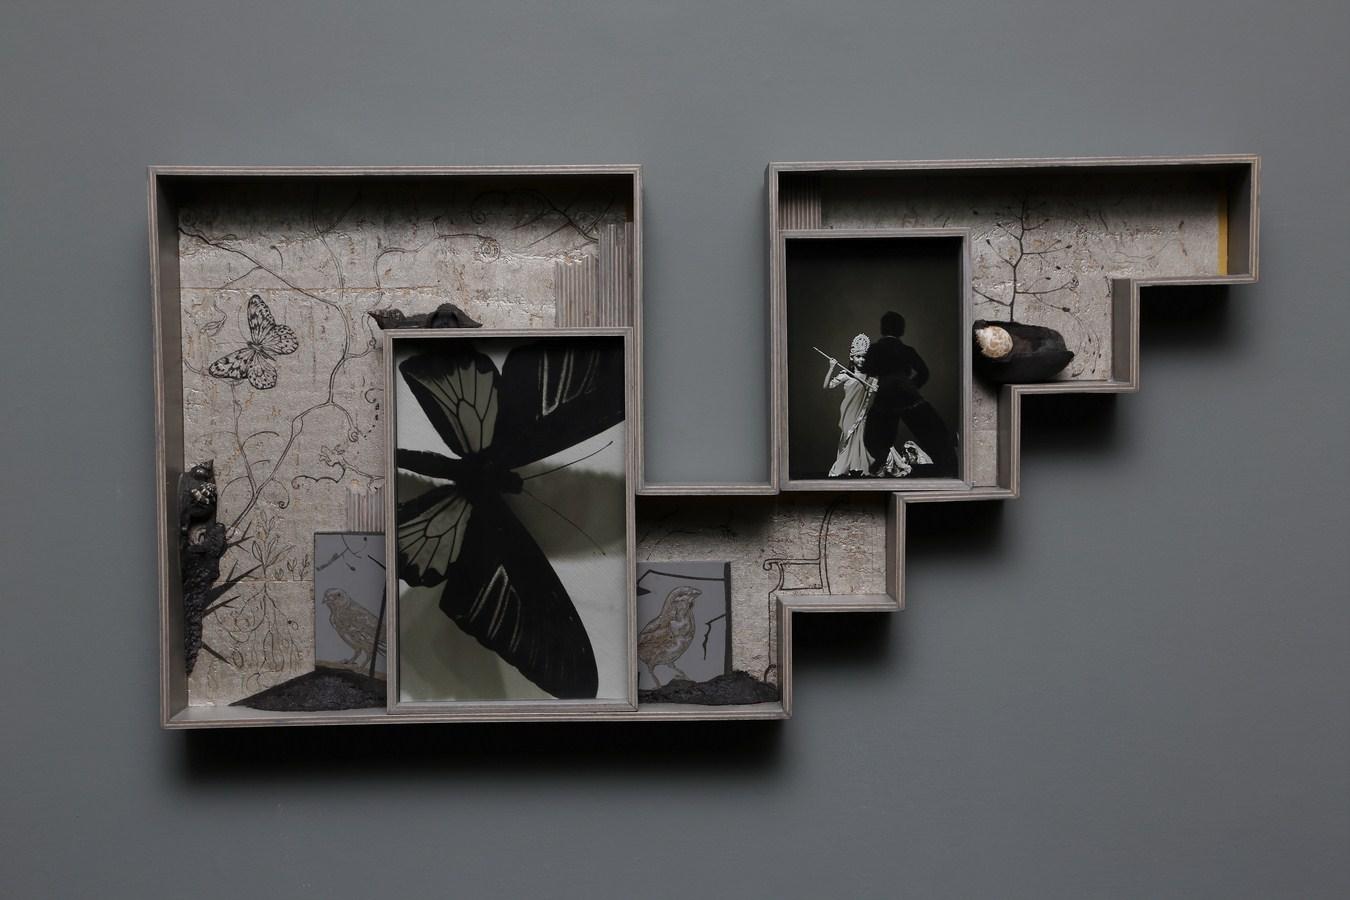 "Dweller of Metropolis - VI | Paper Mache, photograph, plywood, wood, acrylic, wallpaper, auto paint | 15.5"" x 30.5"" | 2017"